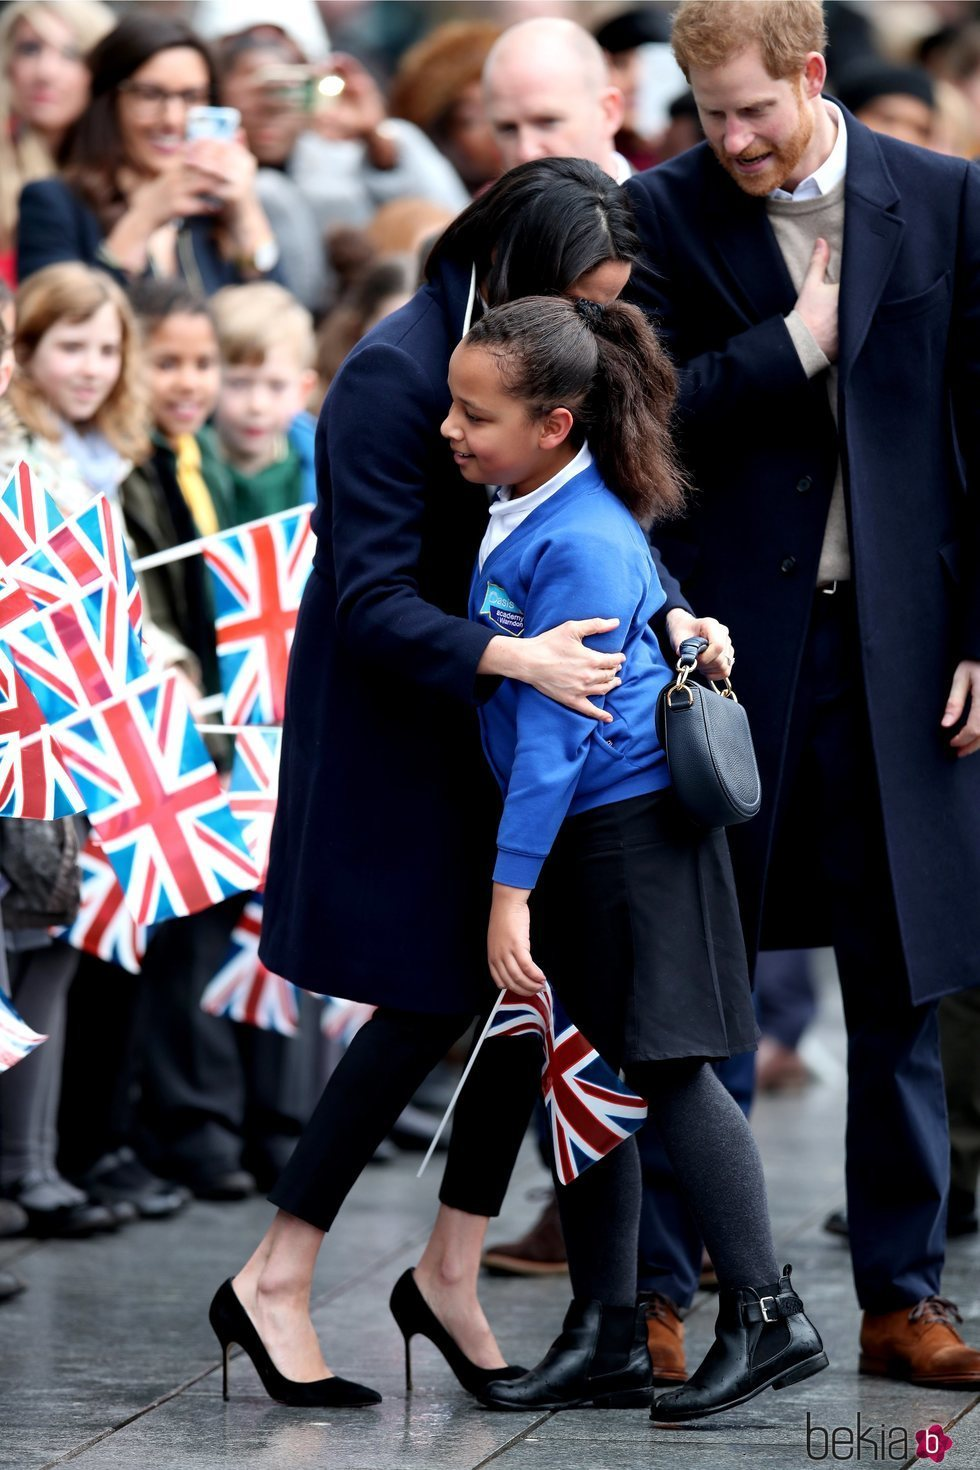 Meghan Markle abraza a una niña en Birmingham